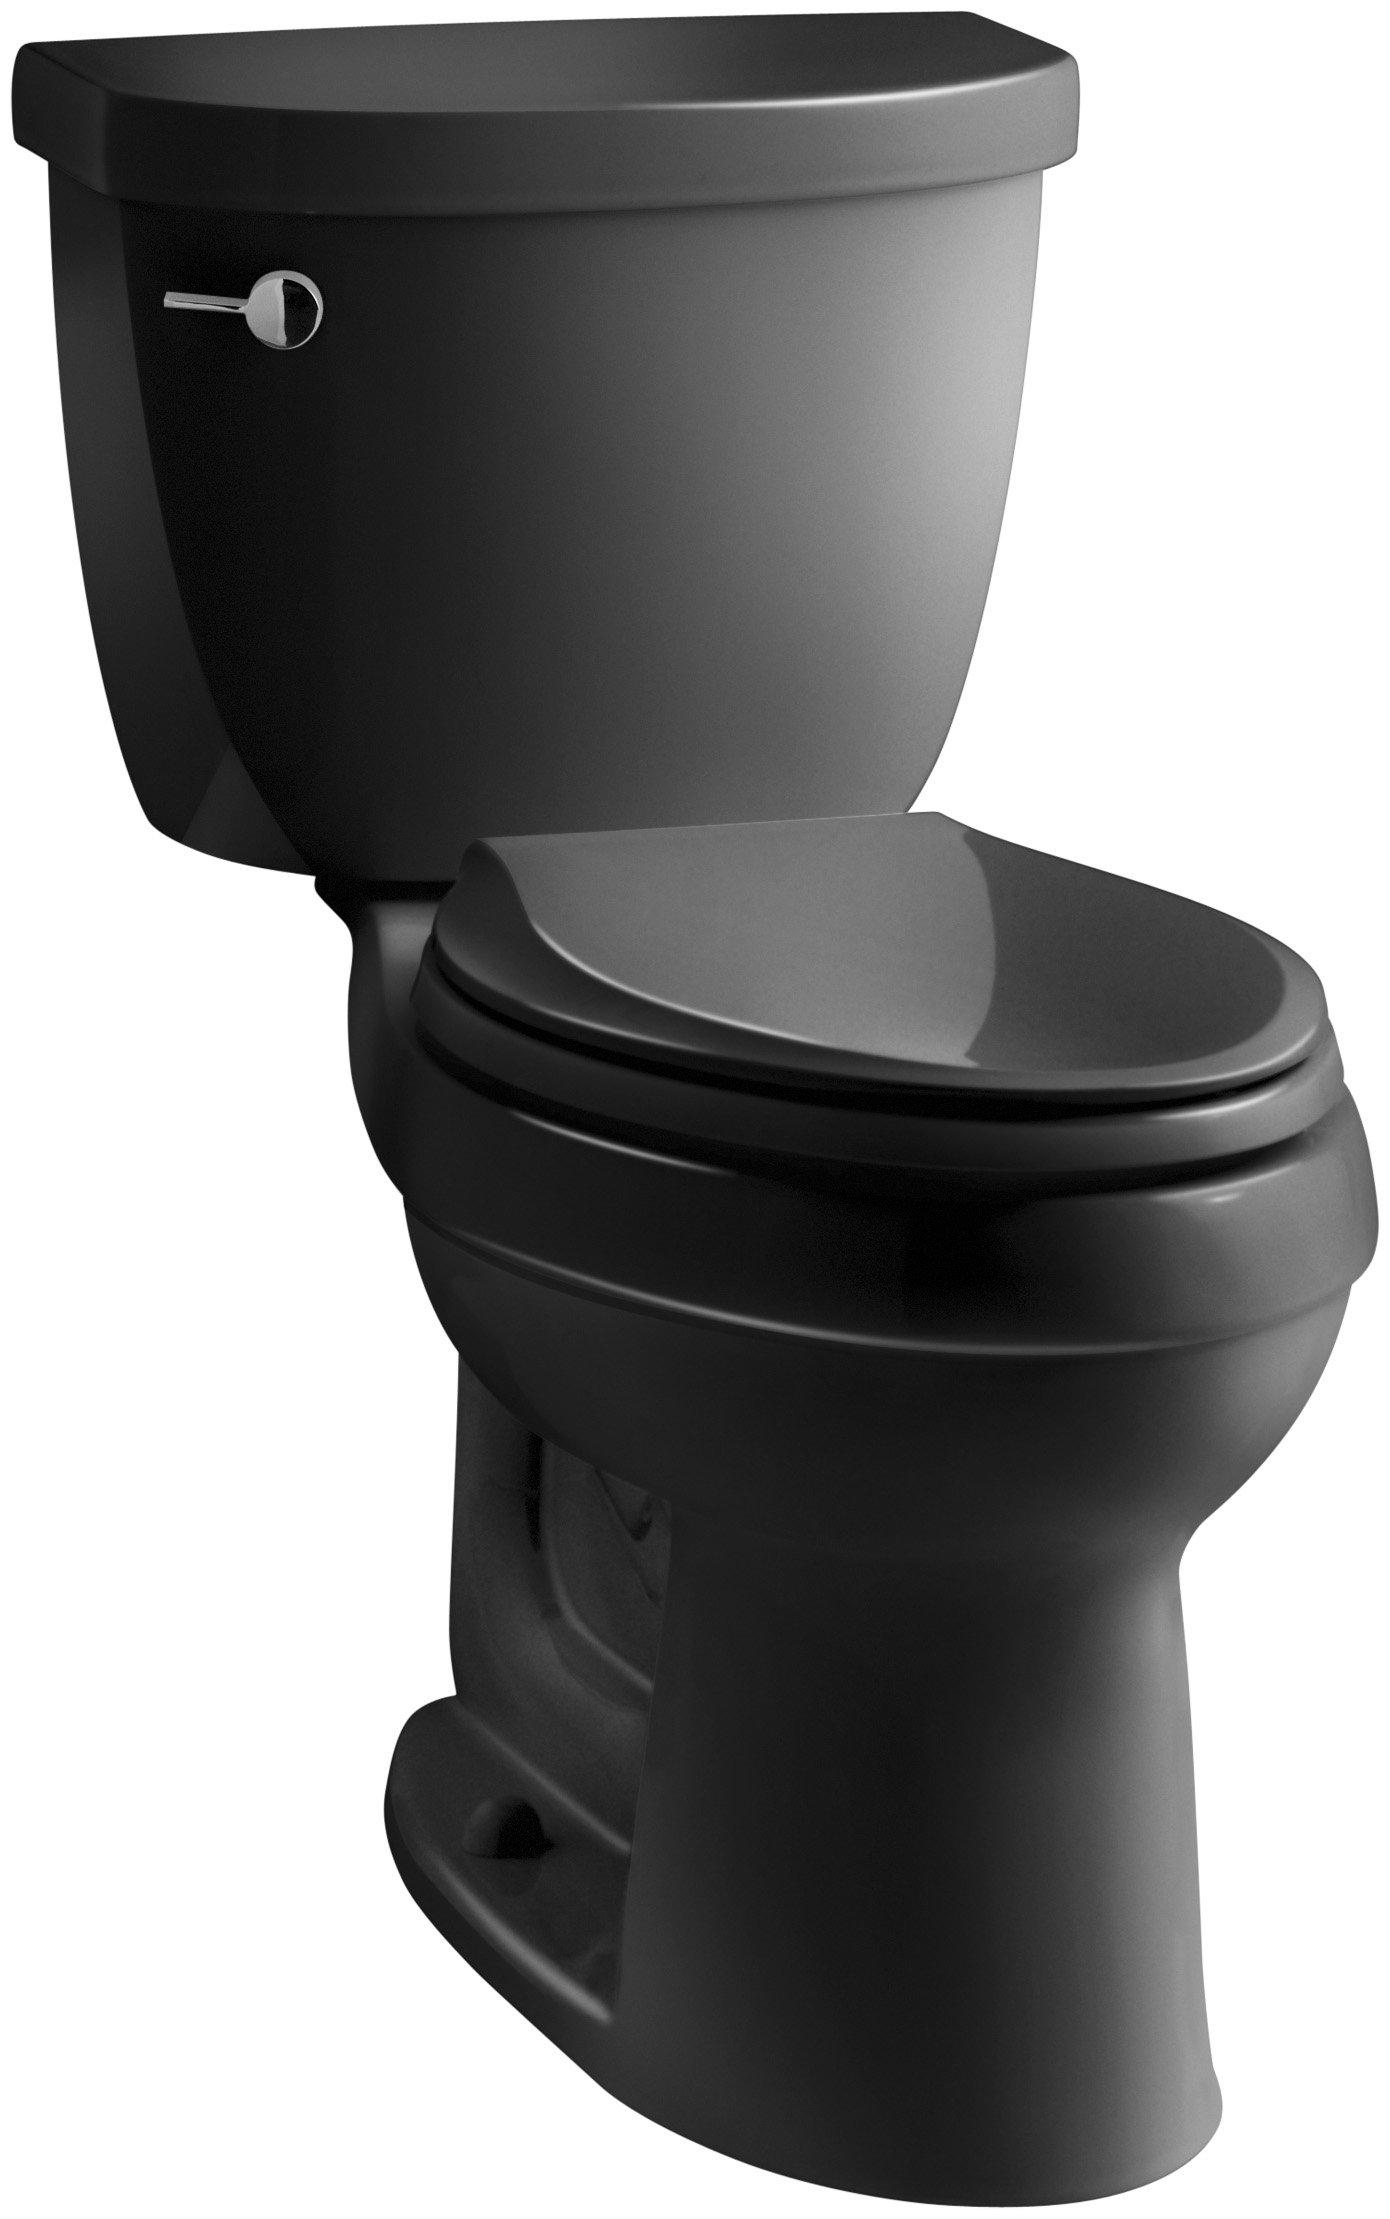 KOHLER K-3609-7 Cimarron Comfort Height Elongated 1.28 gpf Toilet with AquaPiston Technology, Less Seat, Black Black by Kohler